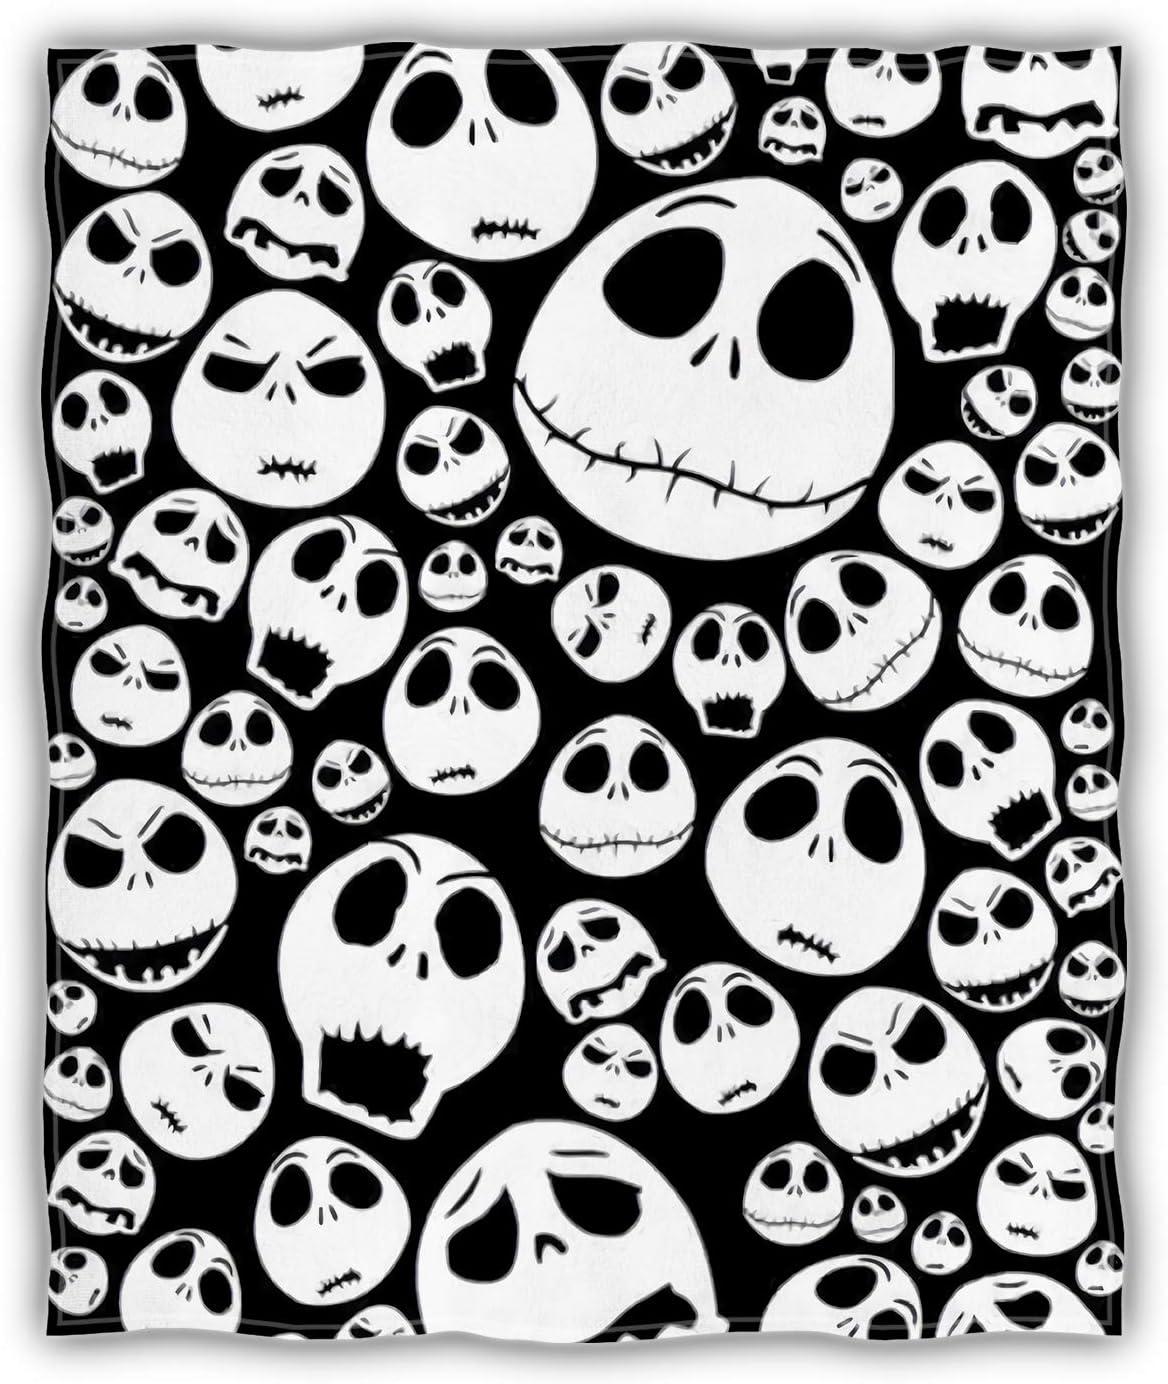 Max 64% OFF ArmuPrint Thick Black Sugar Skull Blanket x Size Soft 60